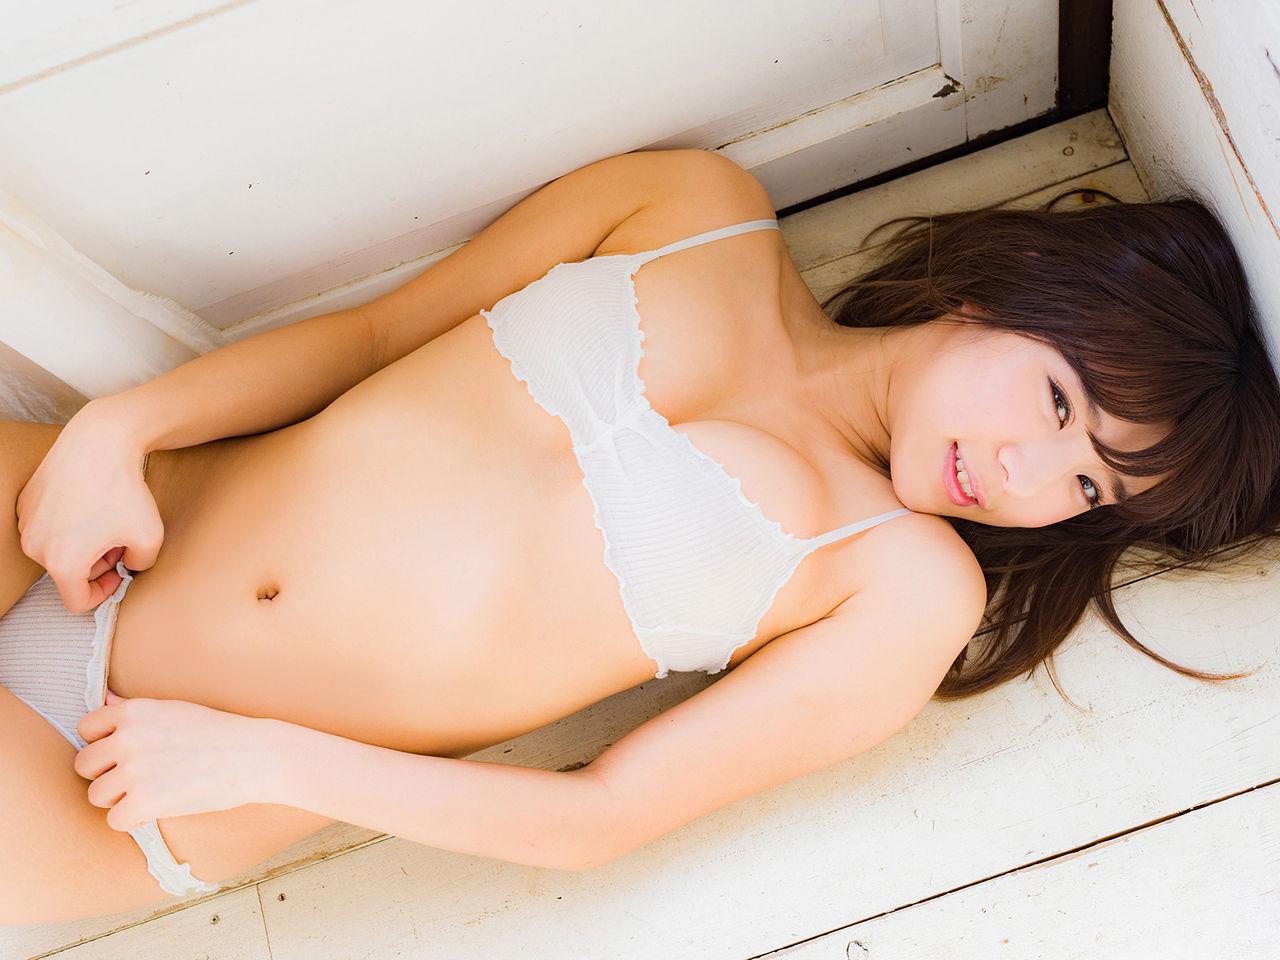 matsumoto_asami050.jpg